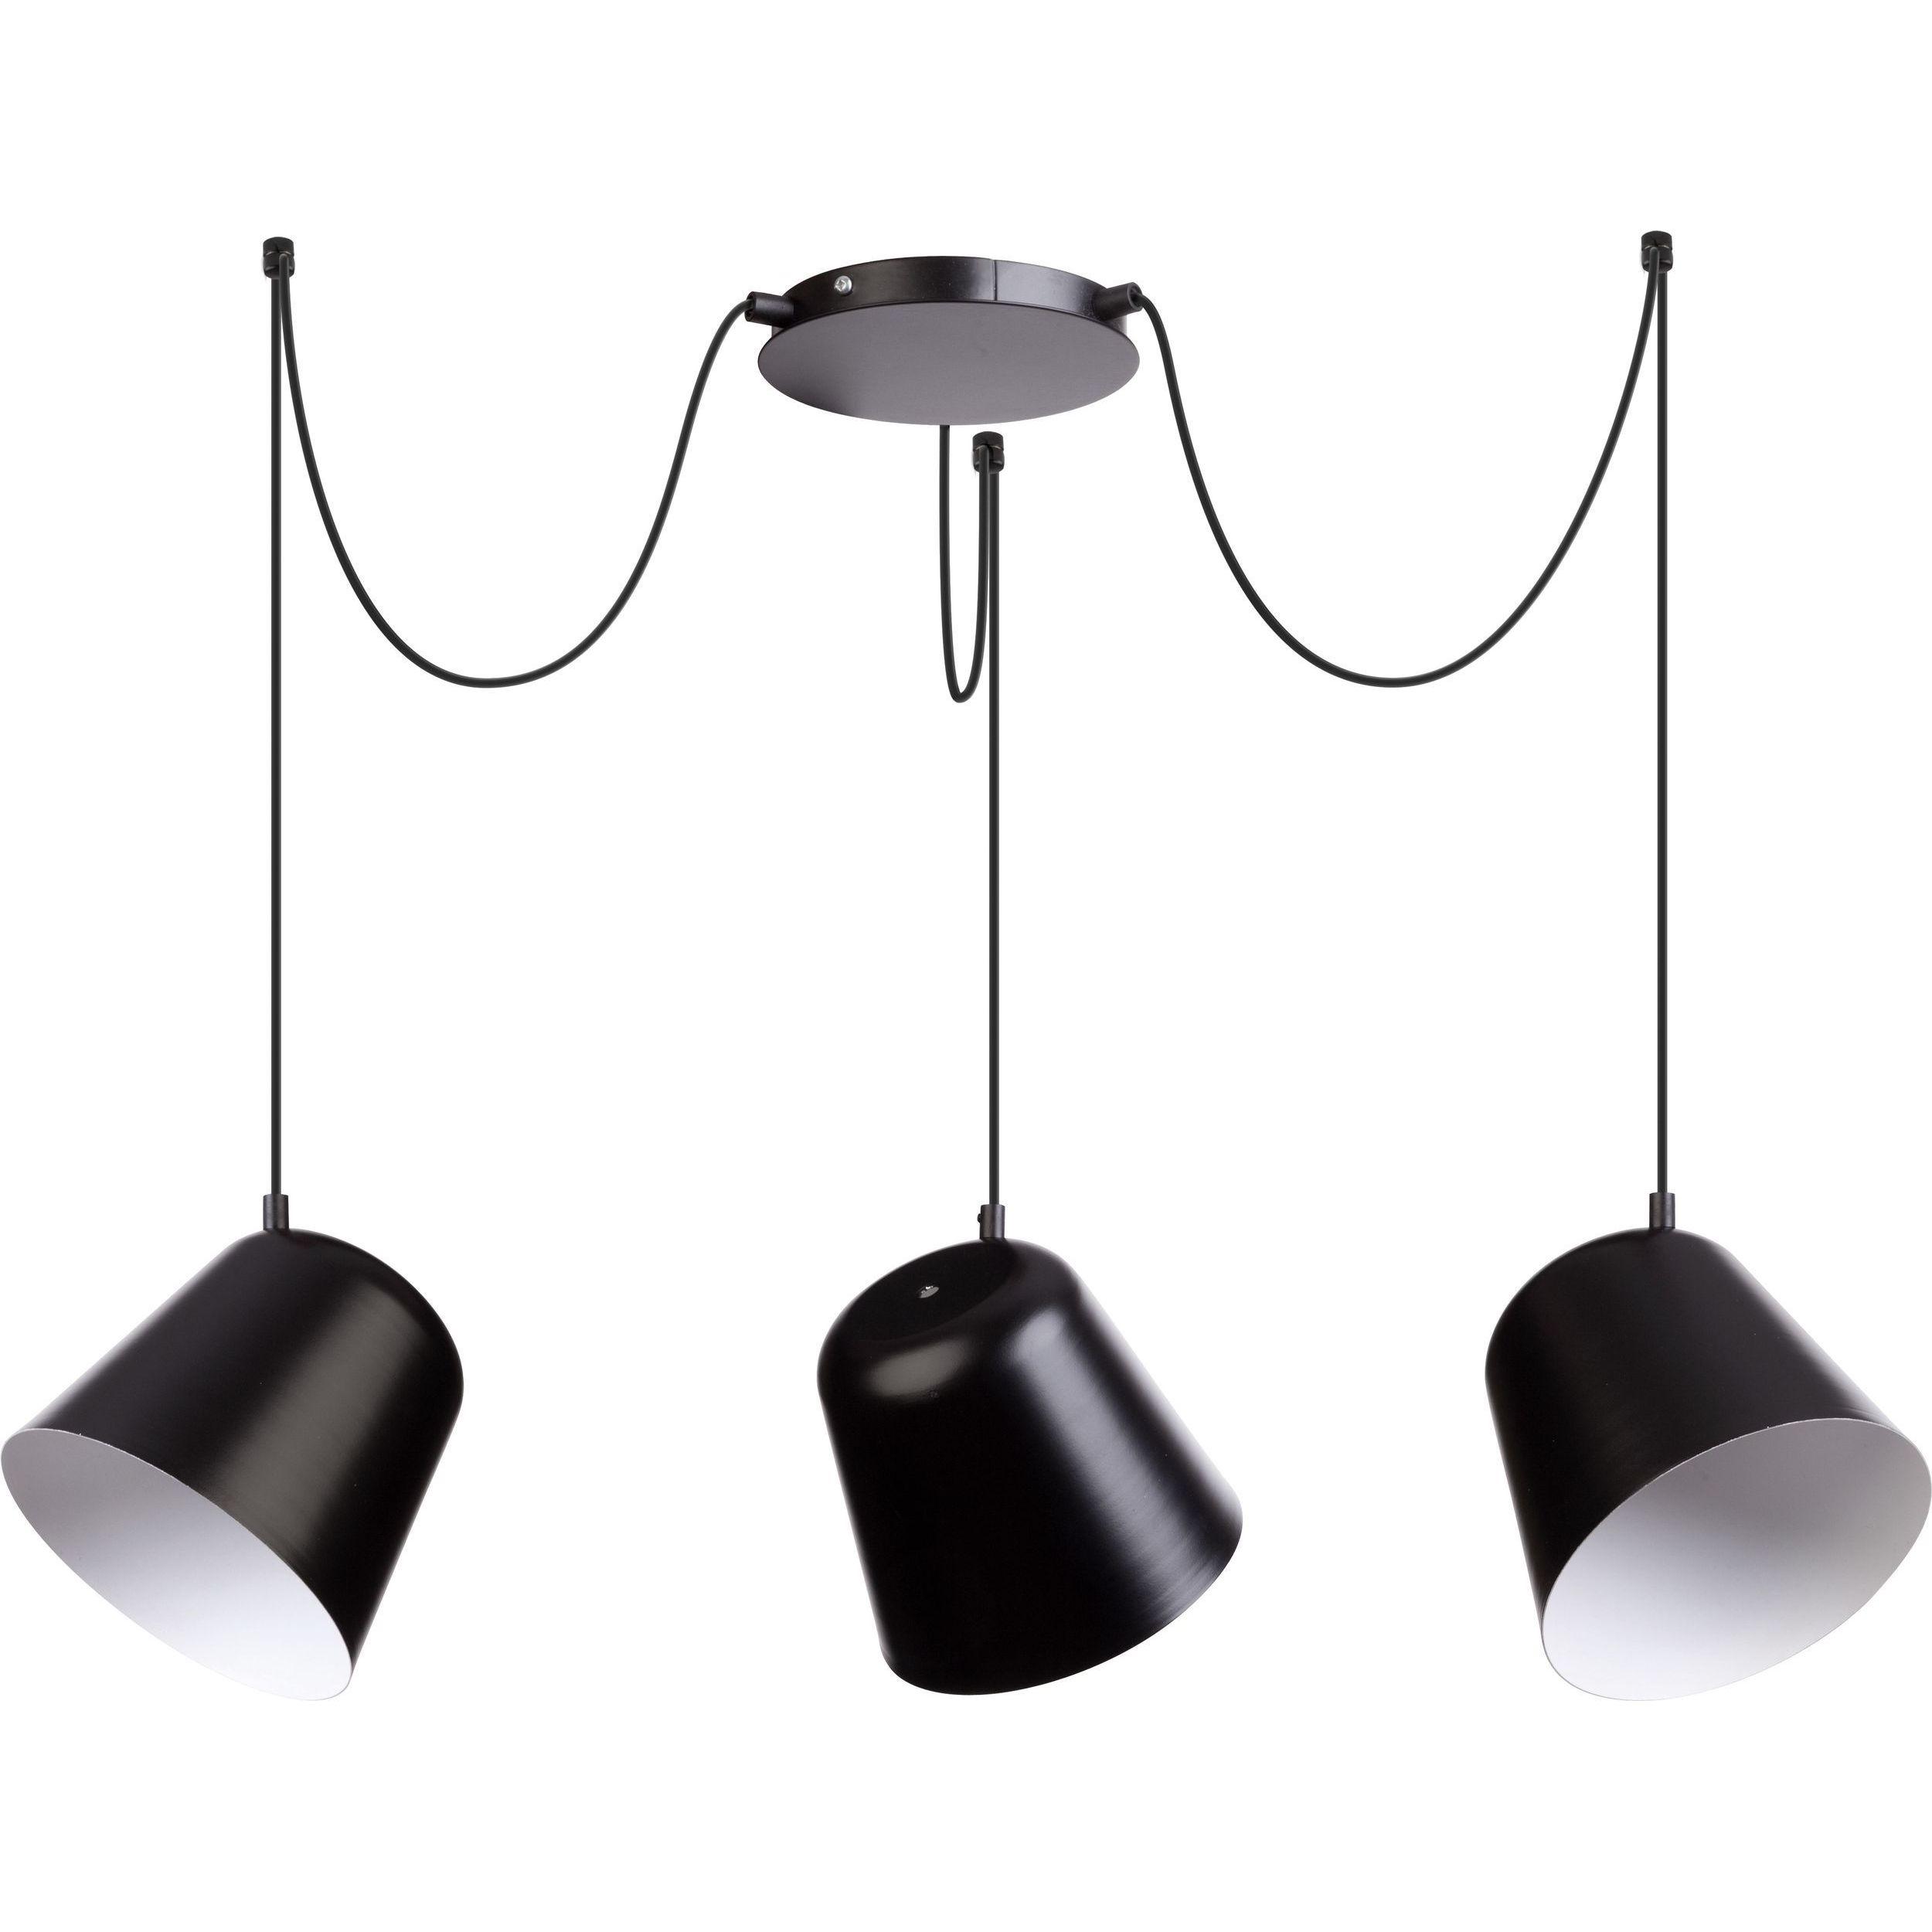 Lampa podwieszana Sigma Jawa x3 Czarny